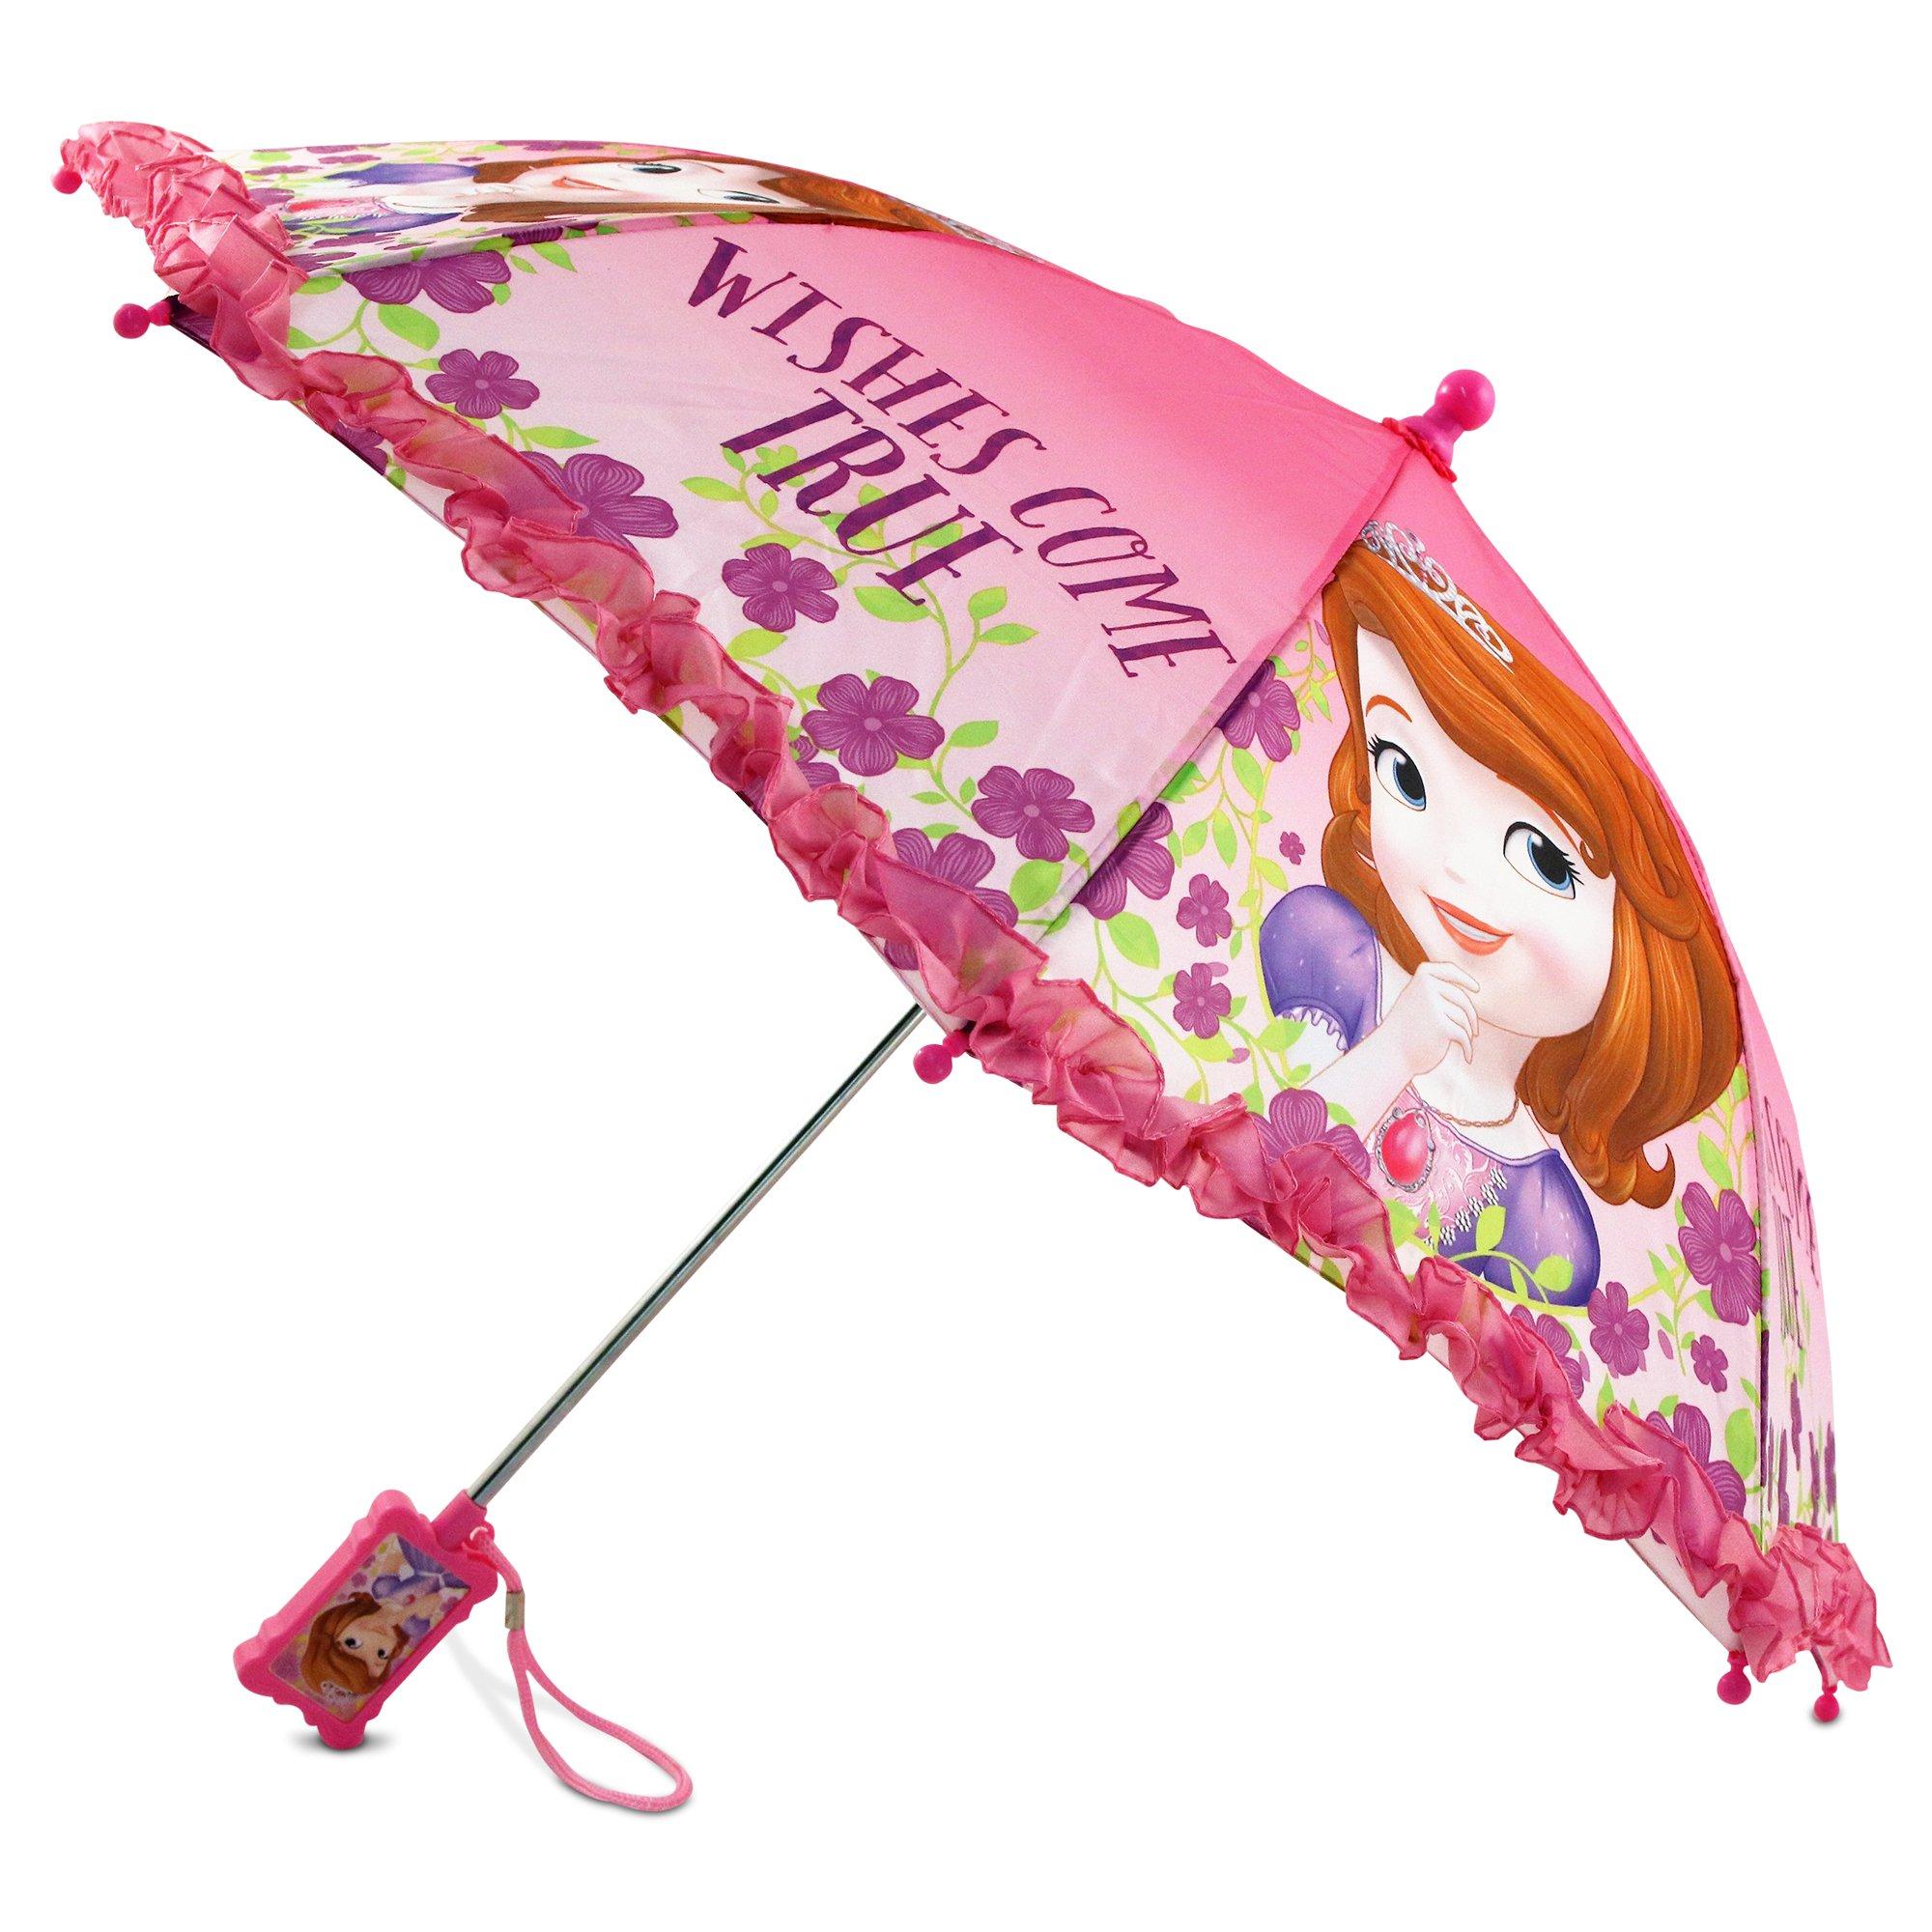 Disney Girls' Little Sofia The First Character Rainwear Umbrella, Pink, Age 3-7 by Disney (Image #4)